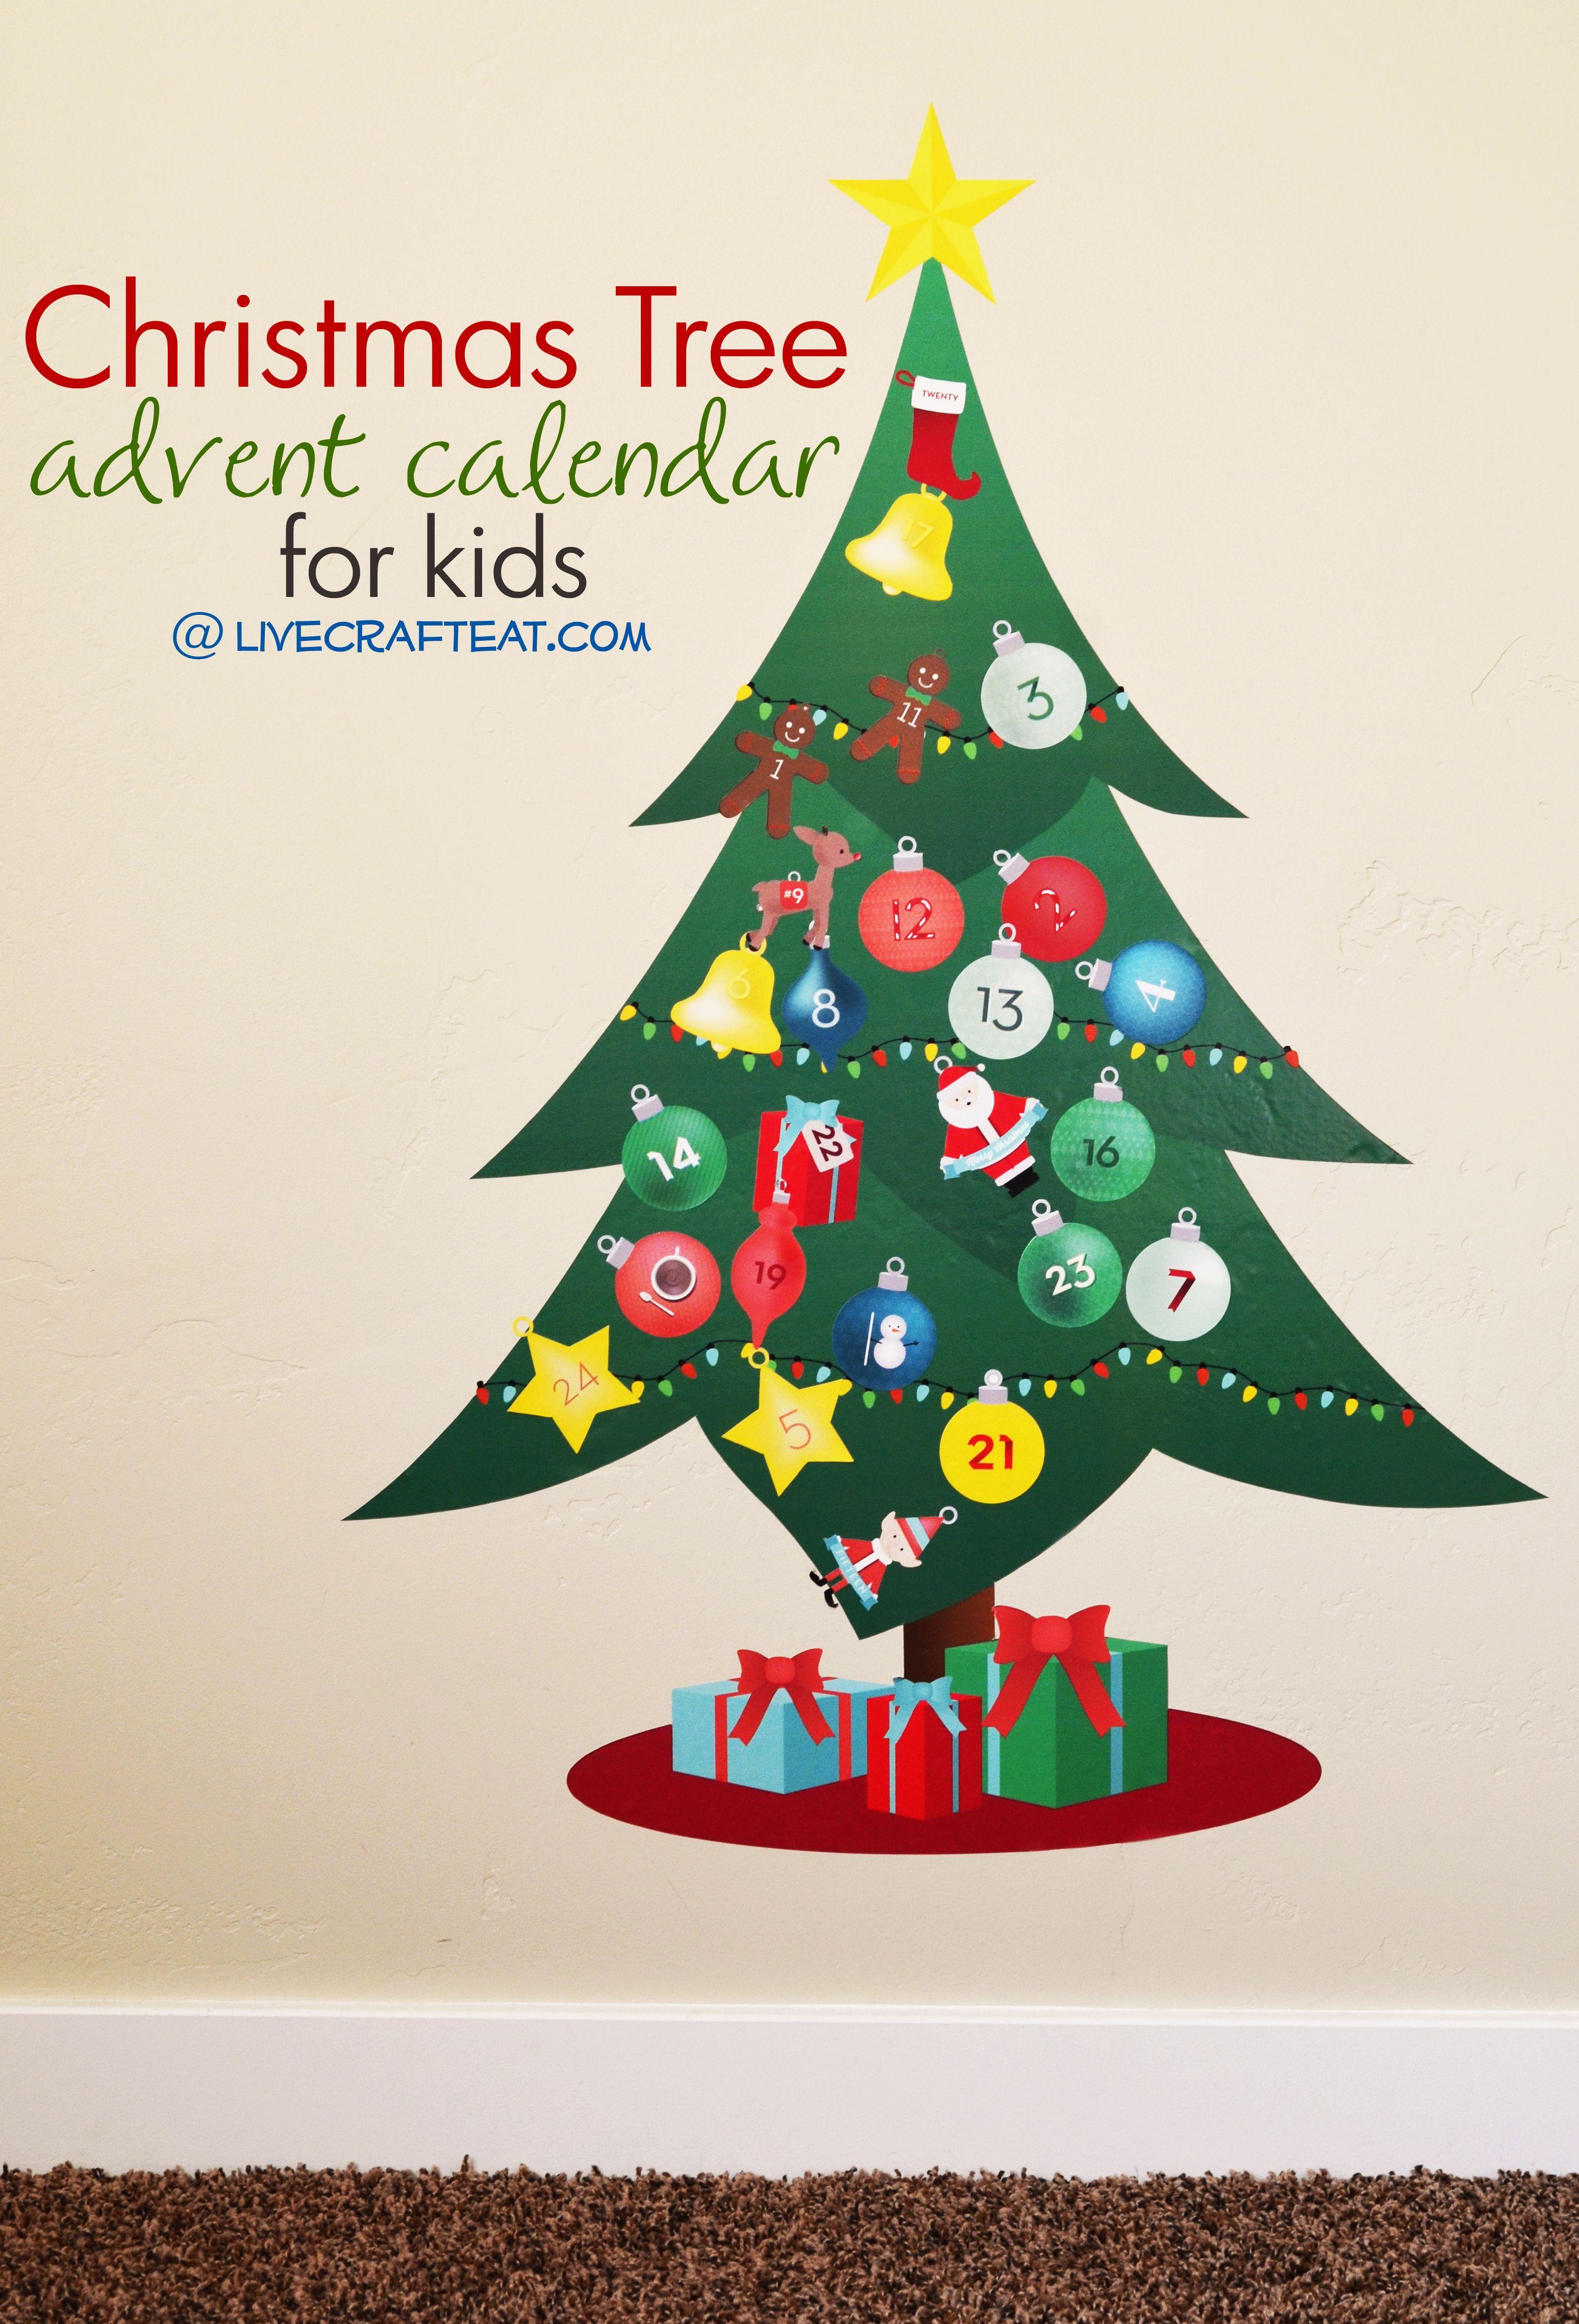 Vinyl Christmas Advent Calendar For Kids